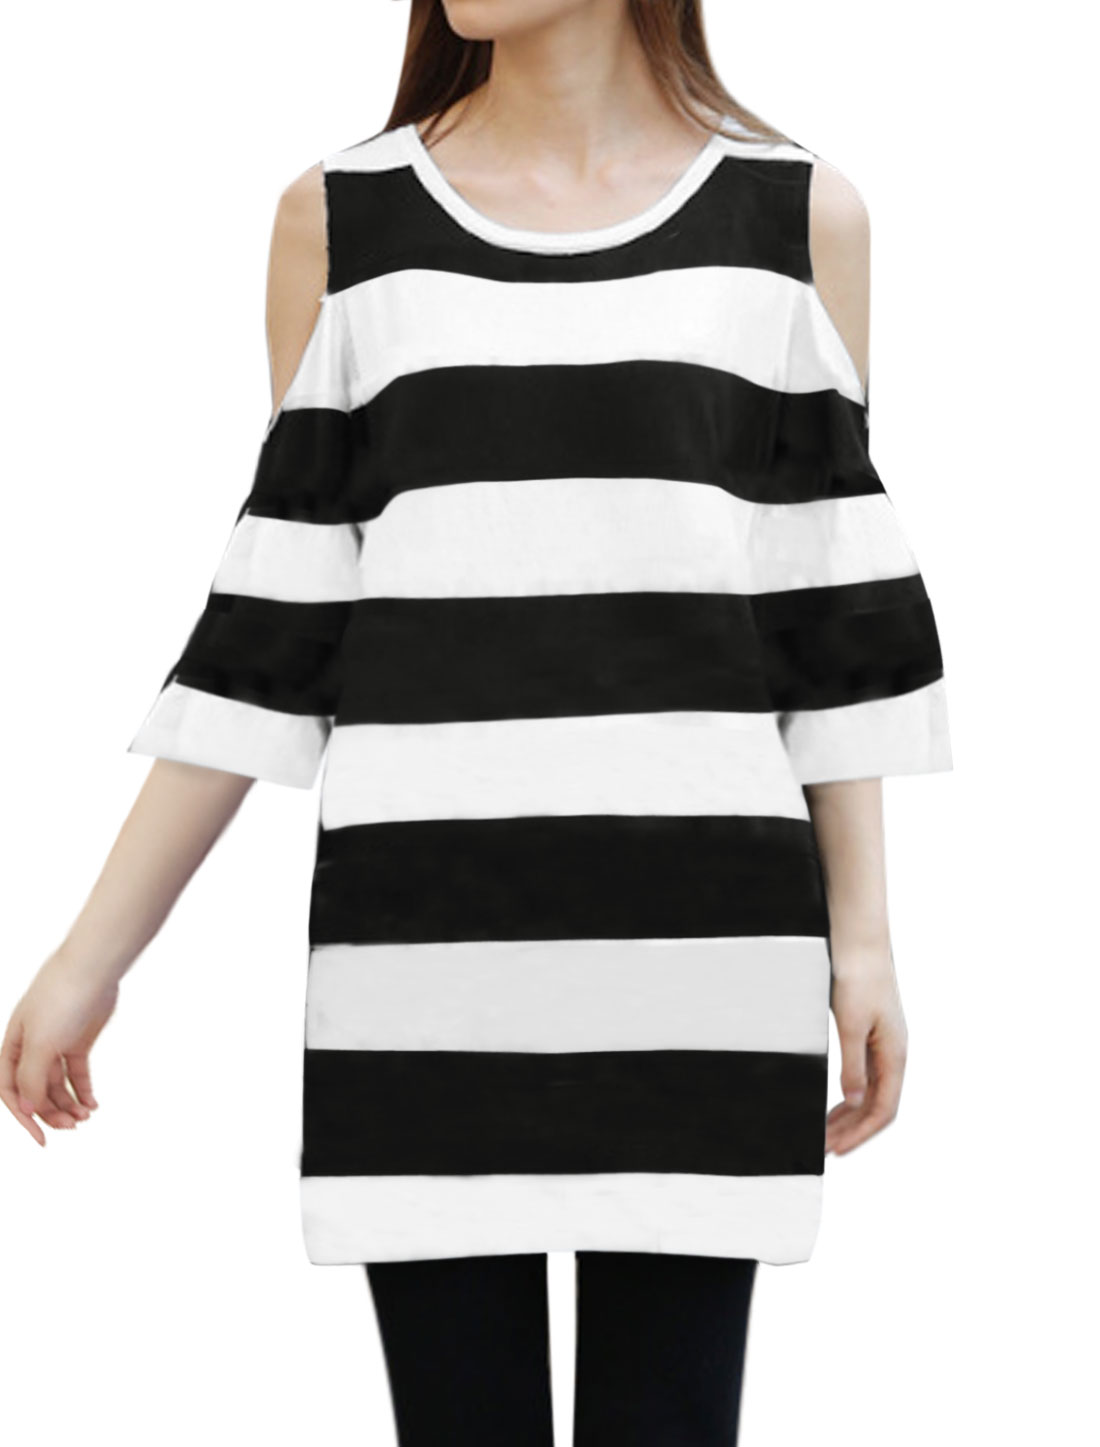 Ladies Cut Out Shoulder Bold Striped Tunic Dress Black White XS